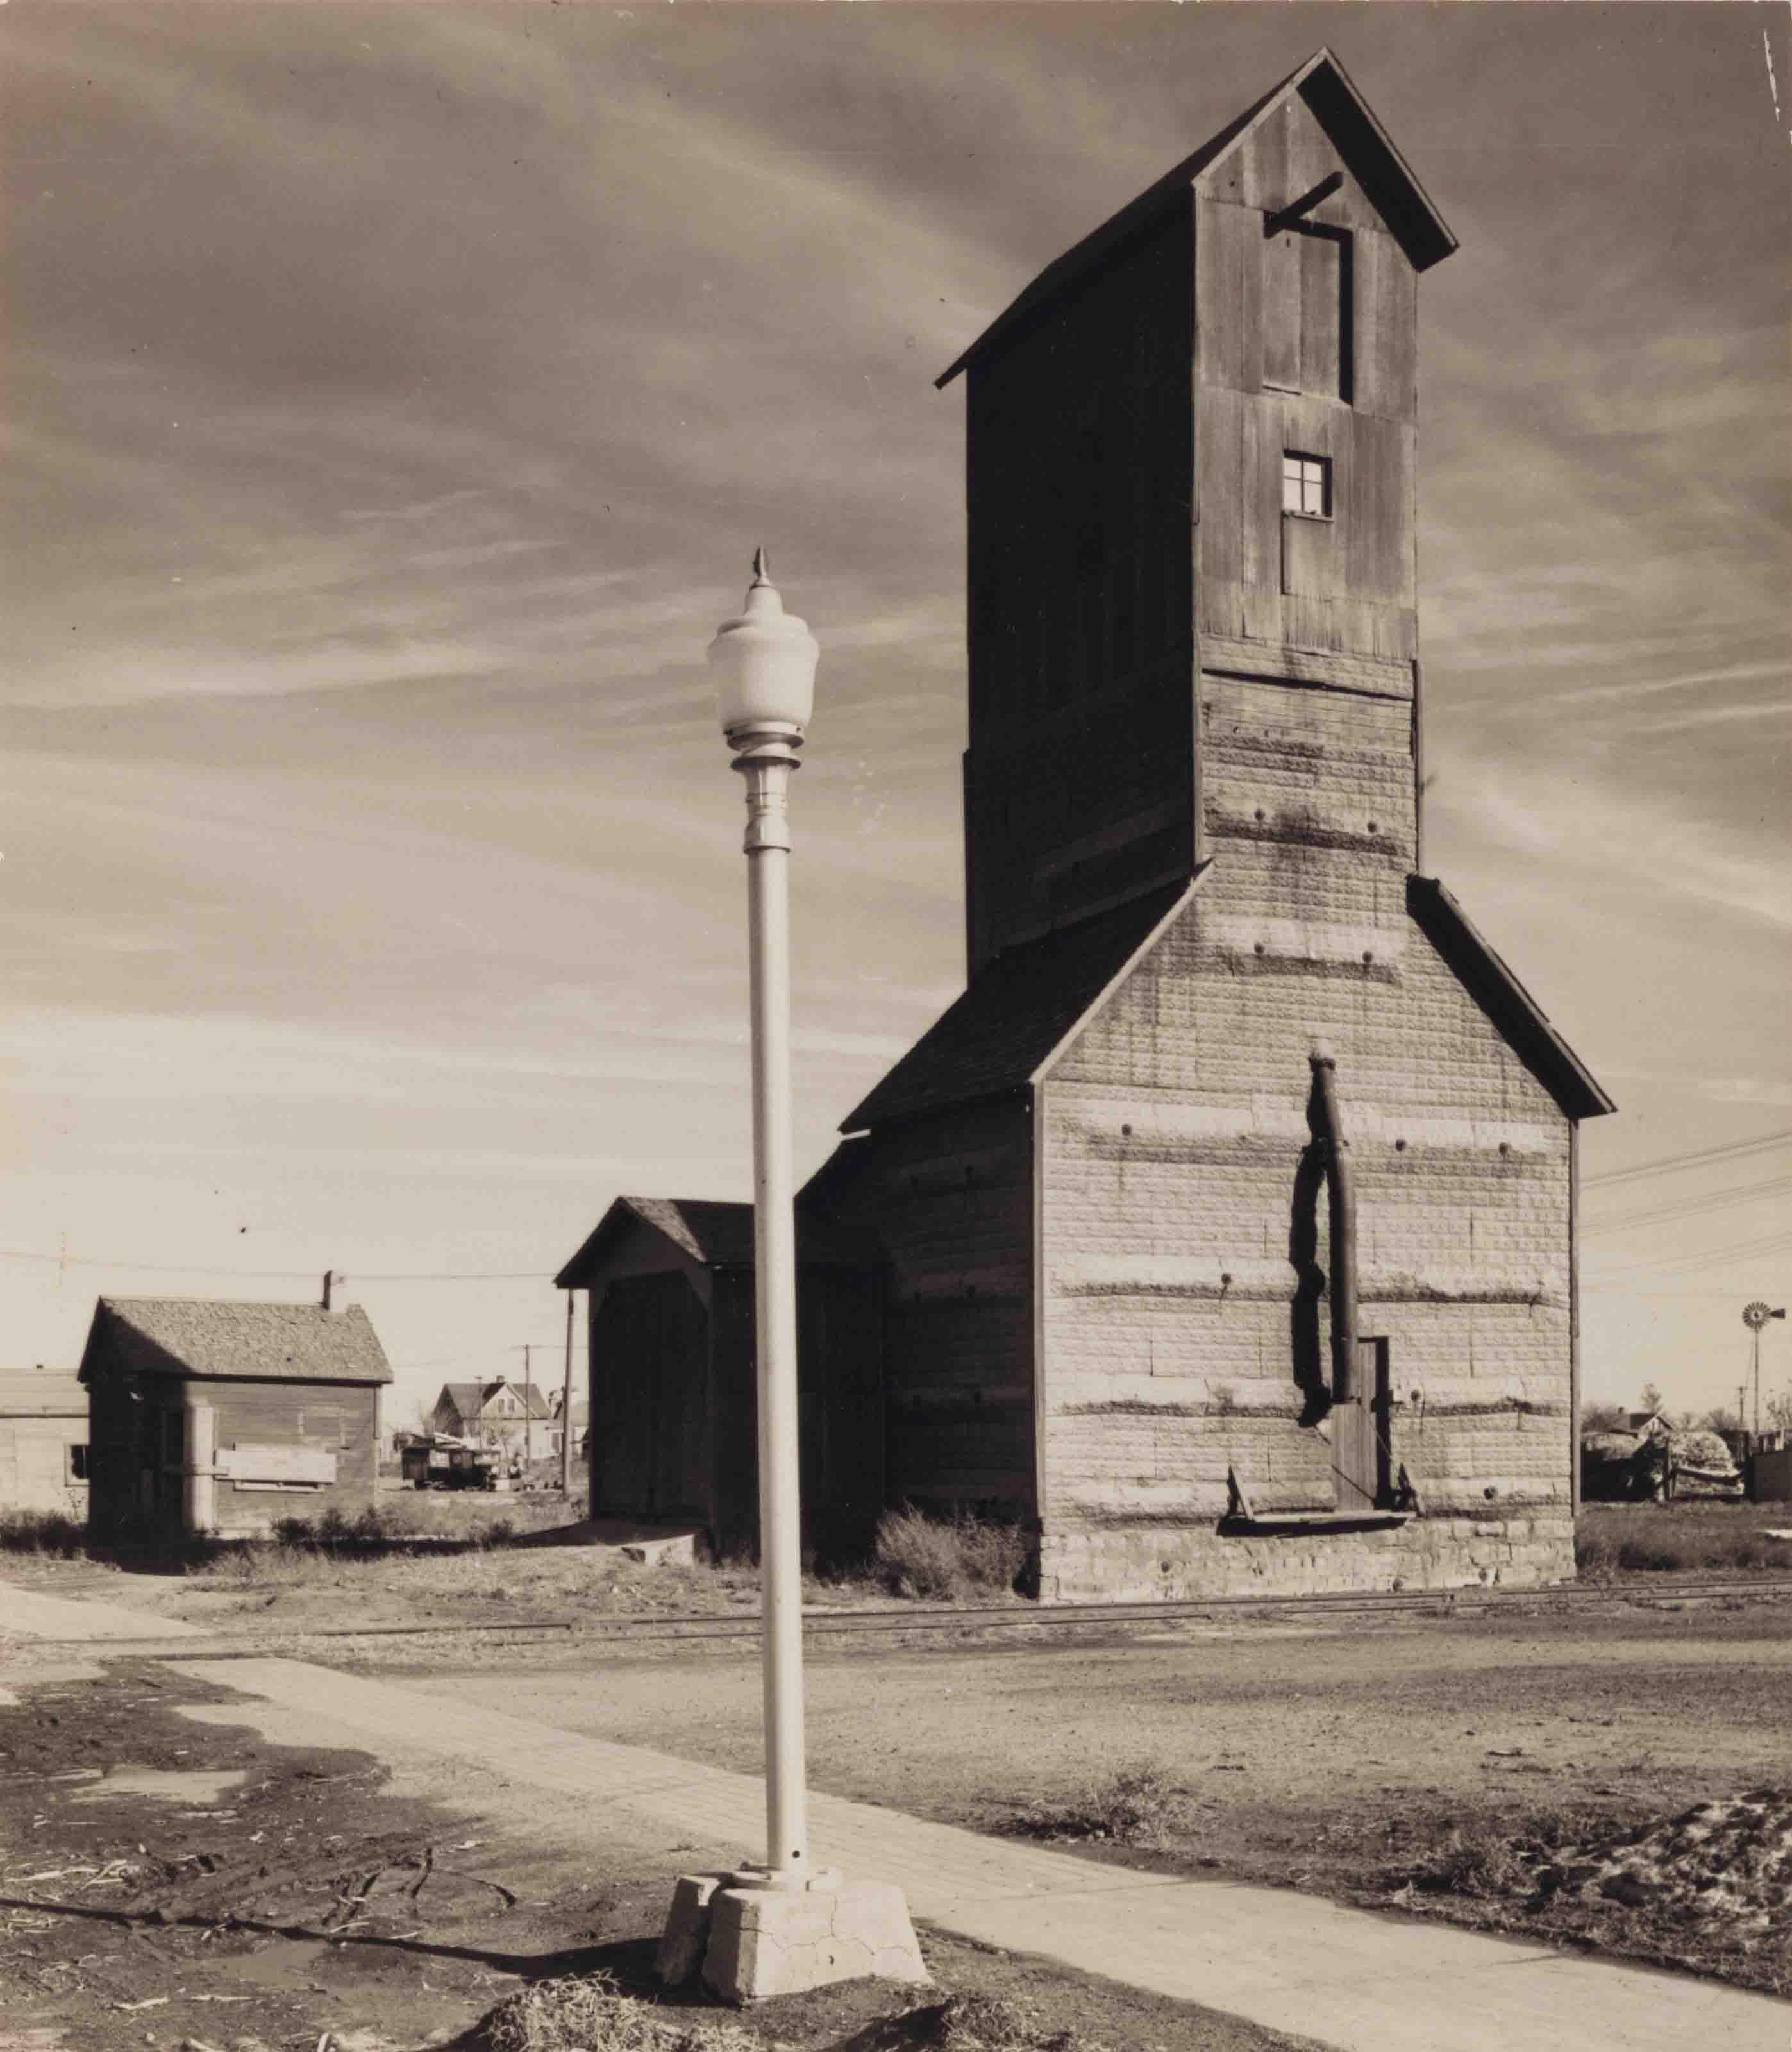 Light Pole and Grain Elevator; and Family Portrait, Season's Greetings, Nebraska, c. 1945